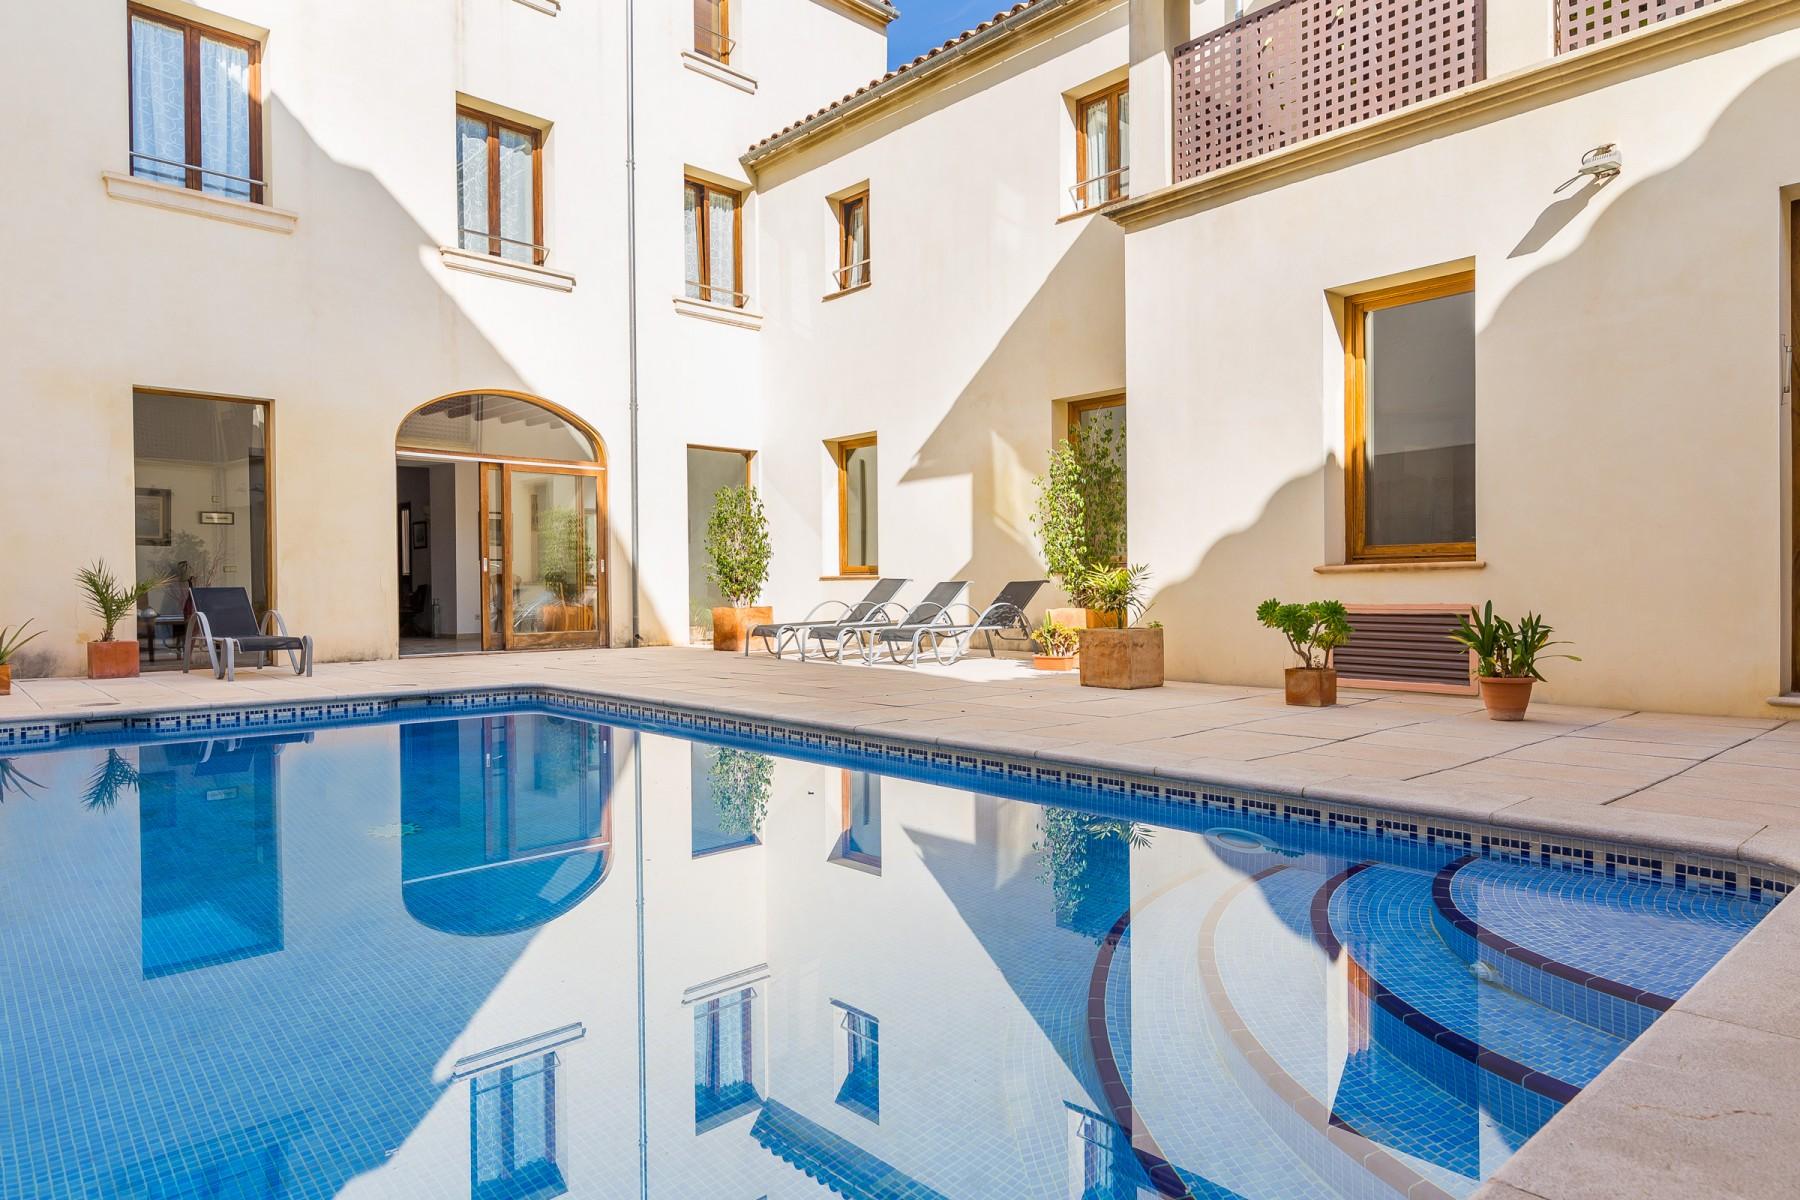 Campins for 8 guests in Sa Pobla, Spanien